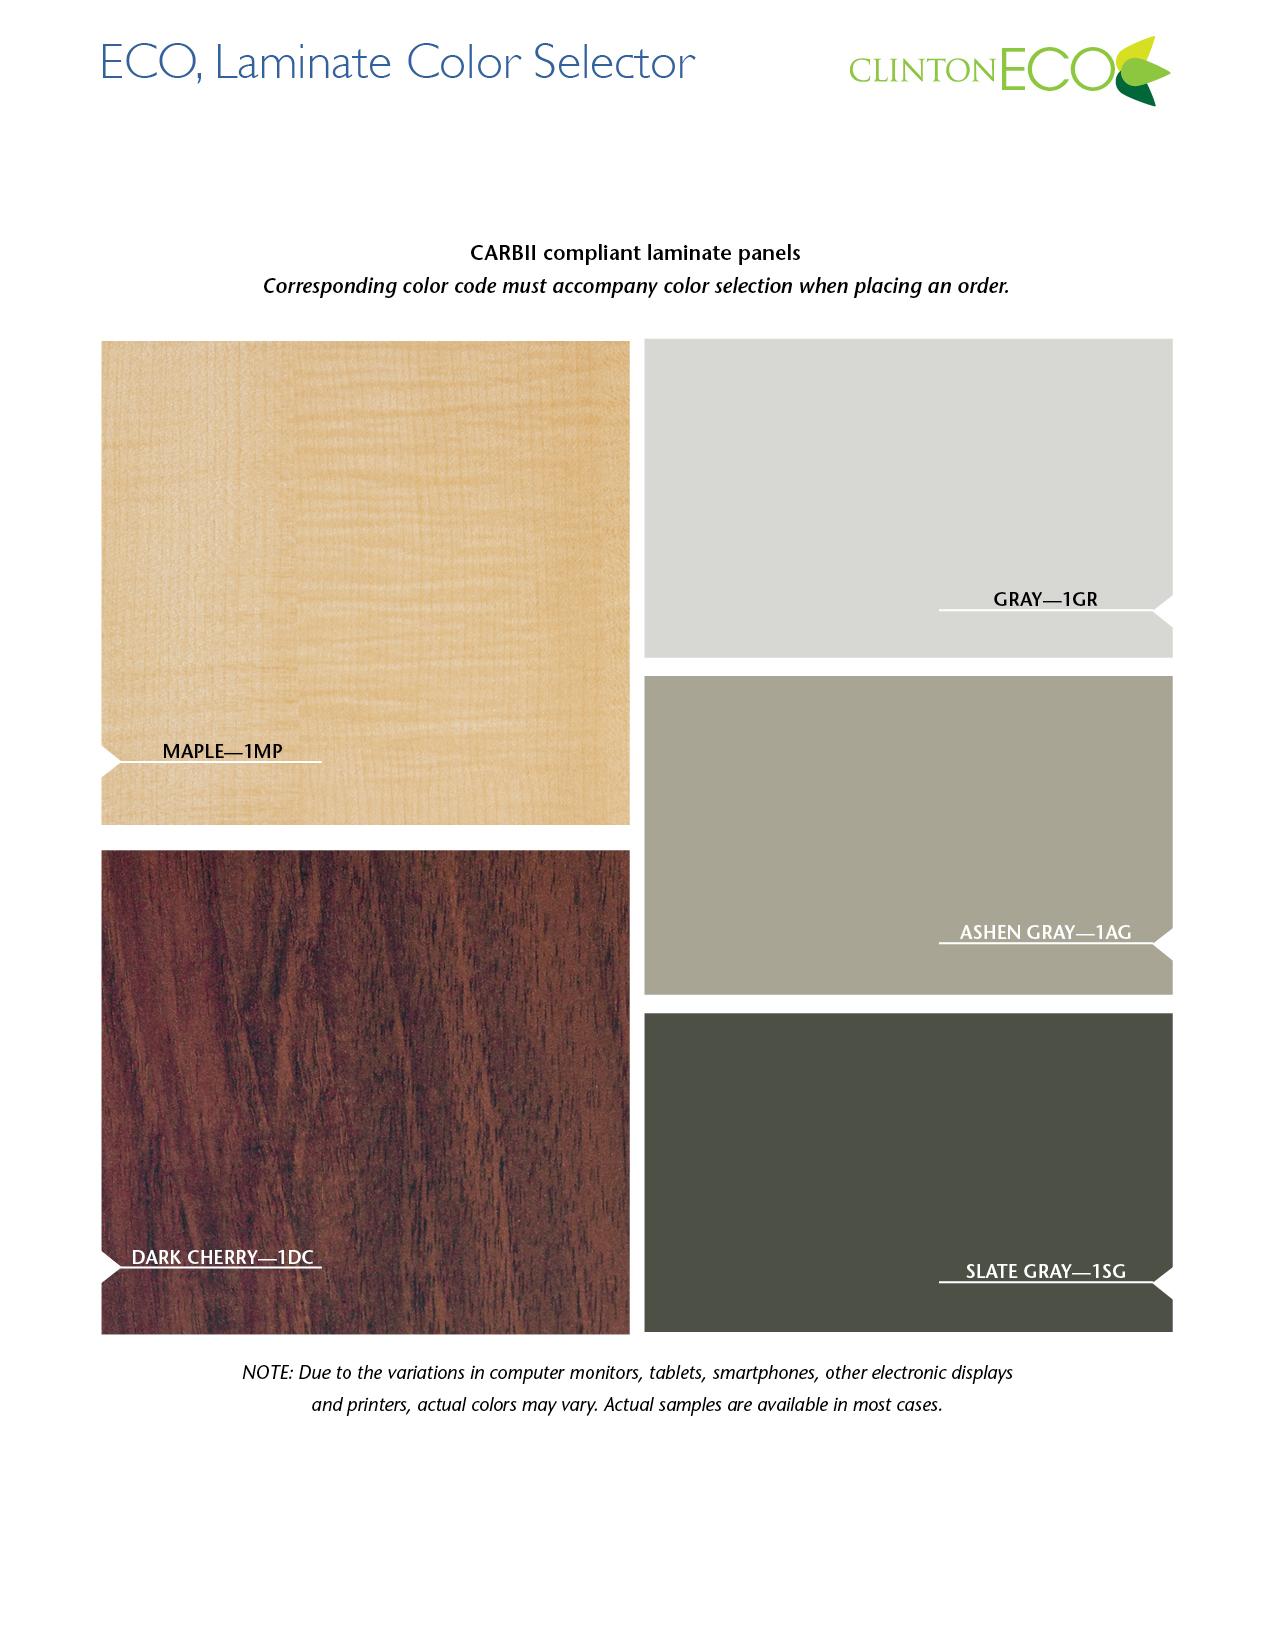 ECO, Laminate Color Selector